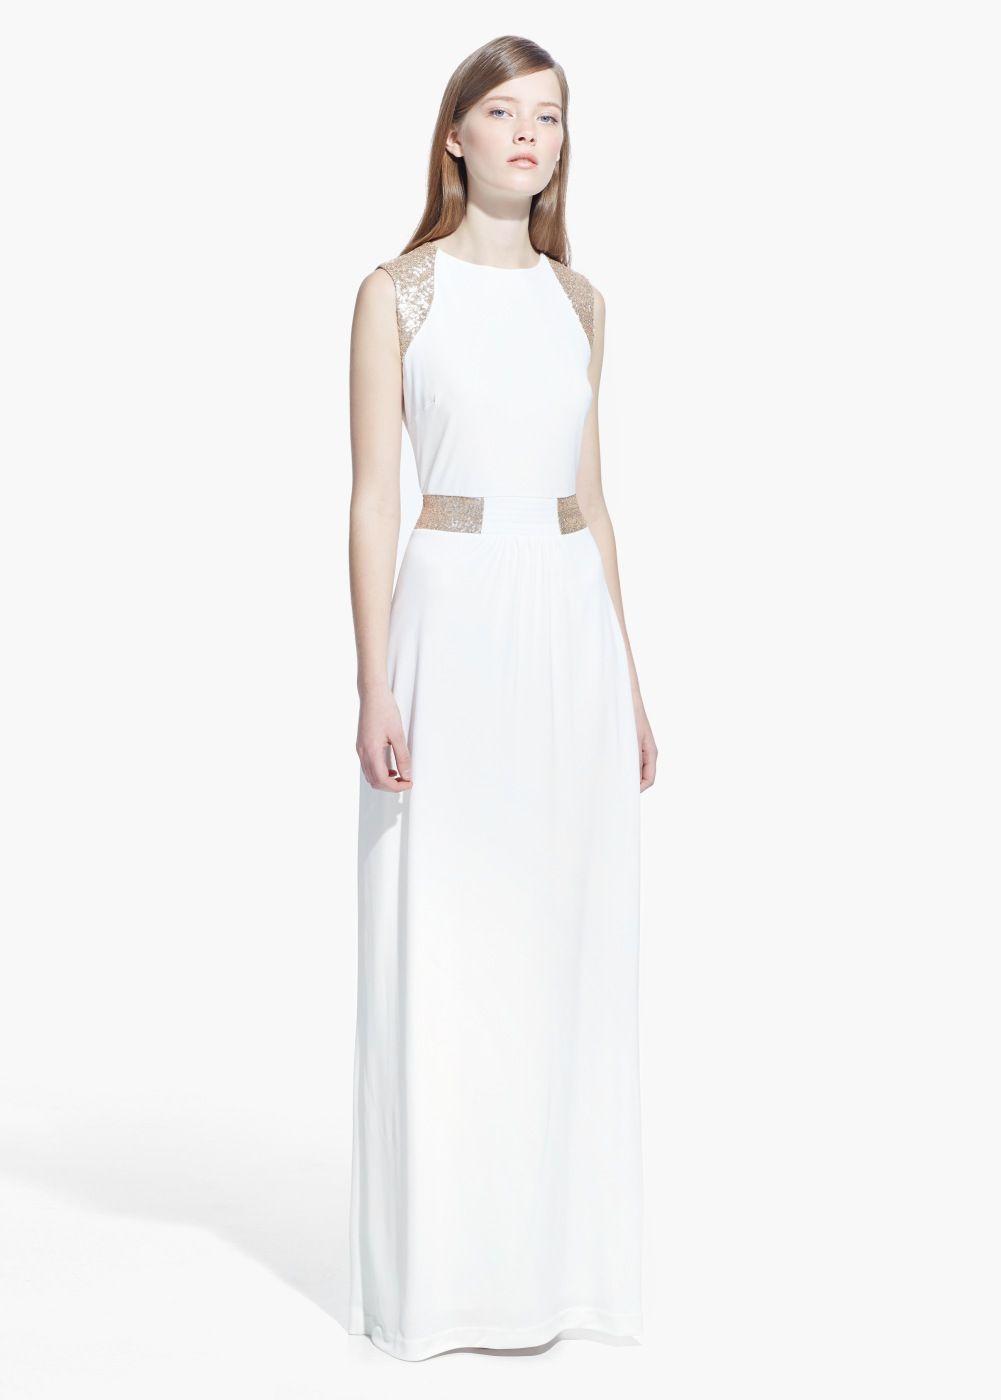 This is quite nice sequin appliqué dress budget wedding dress